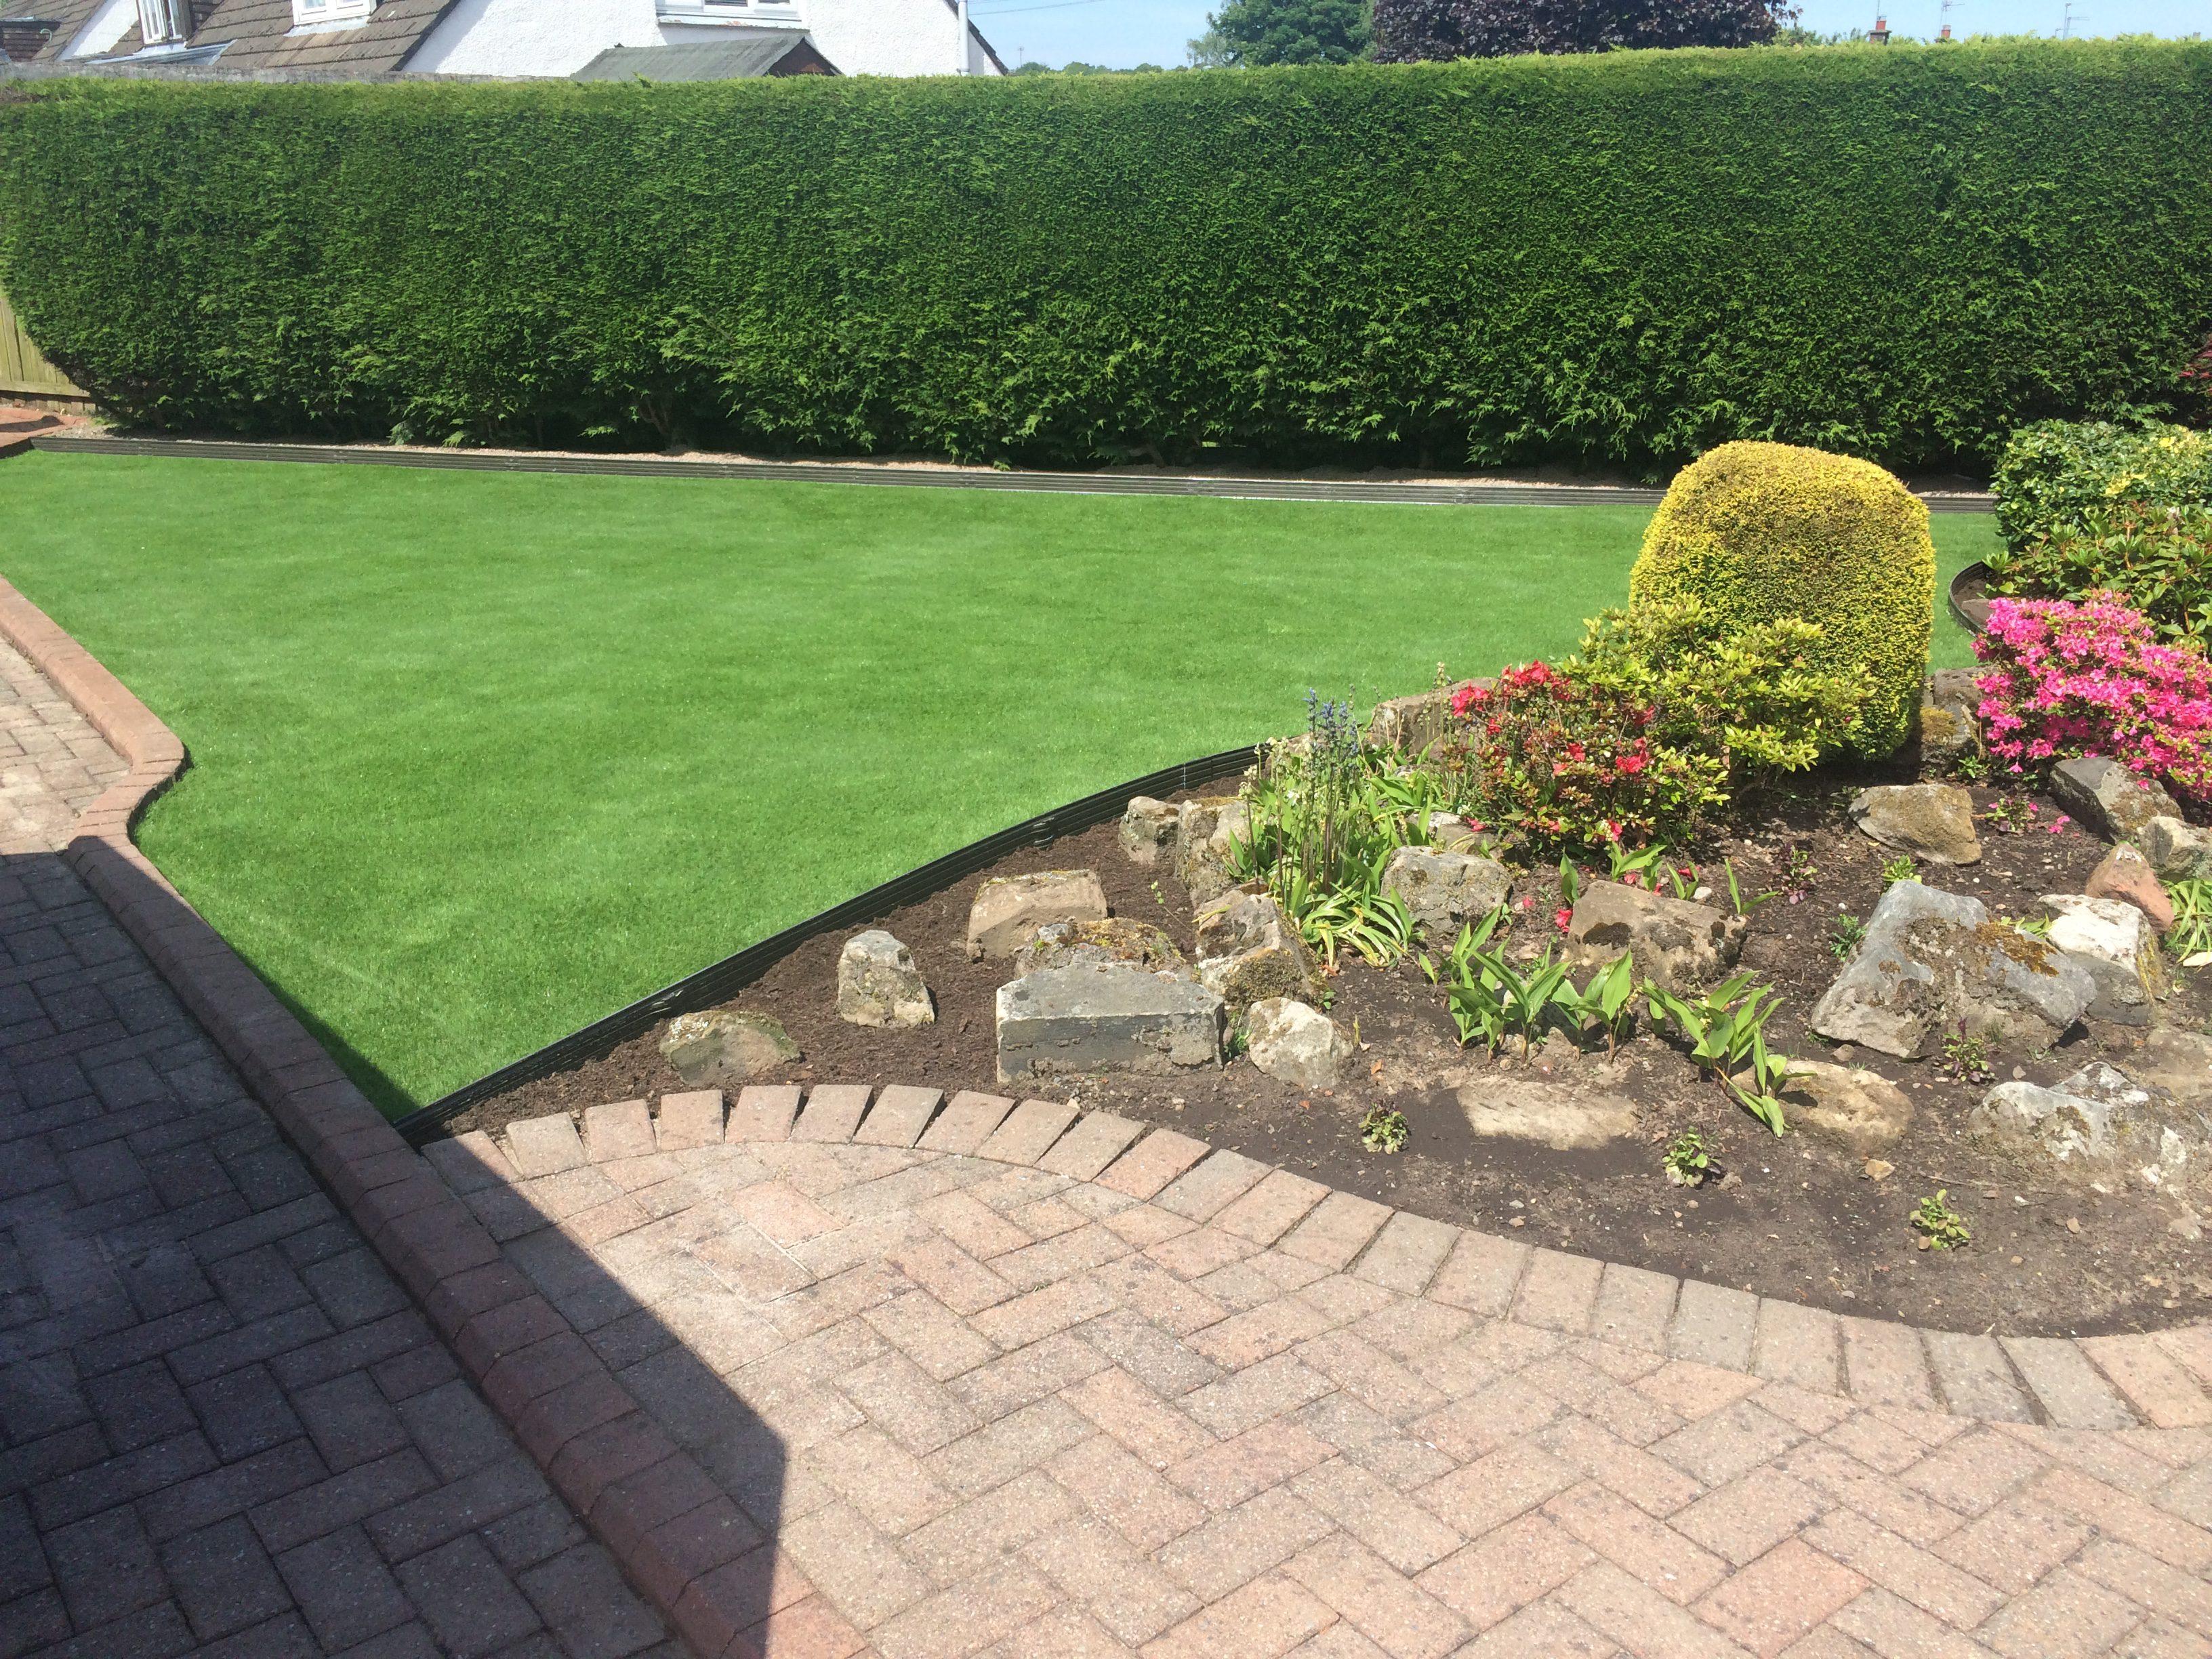 Artificial Grass Scotland - The Artificial Grass Co  Scotland